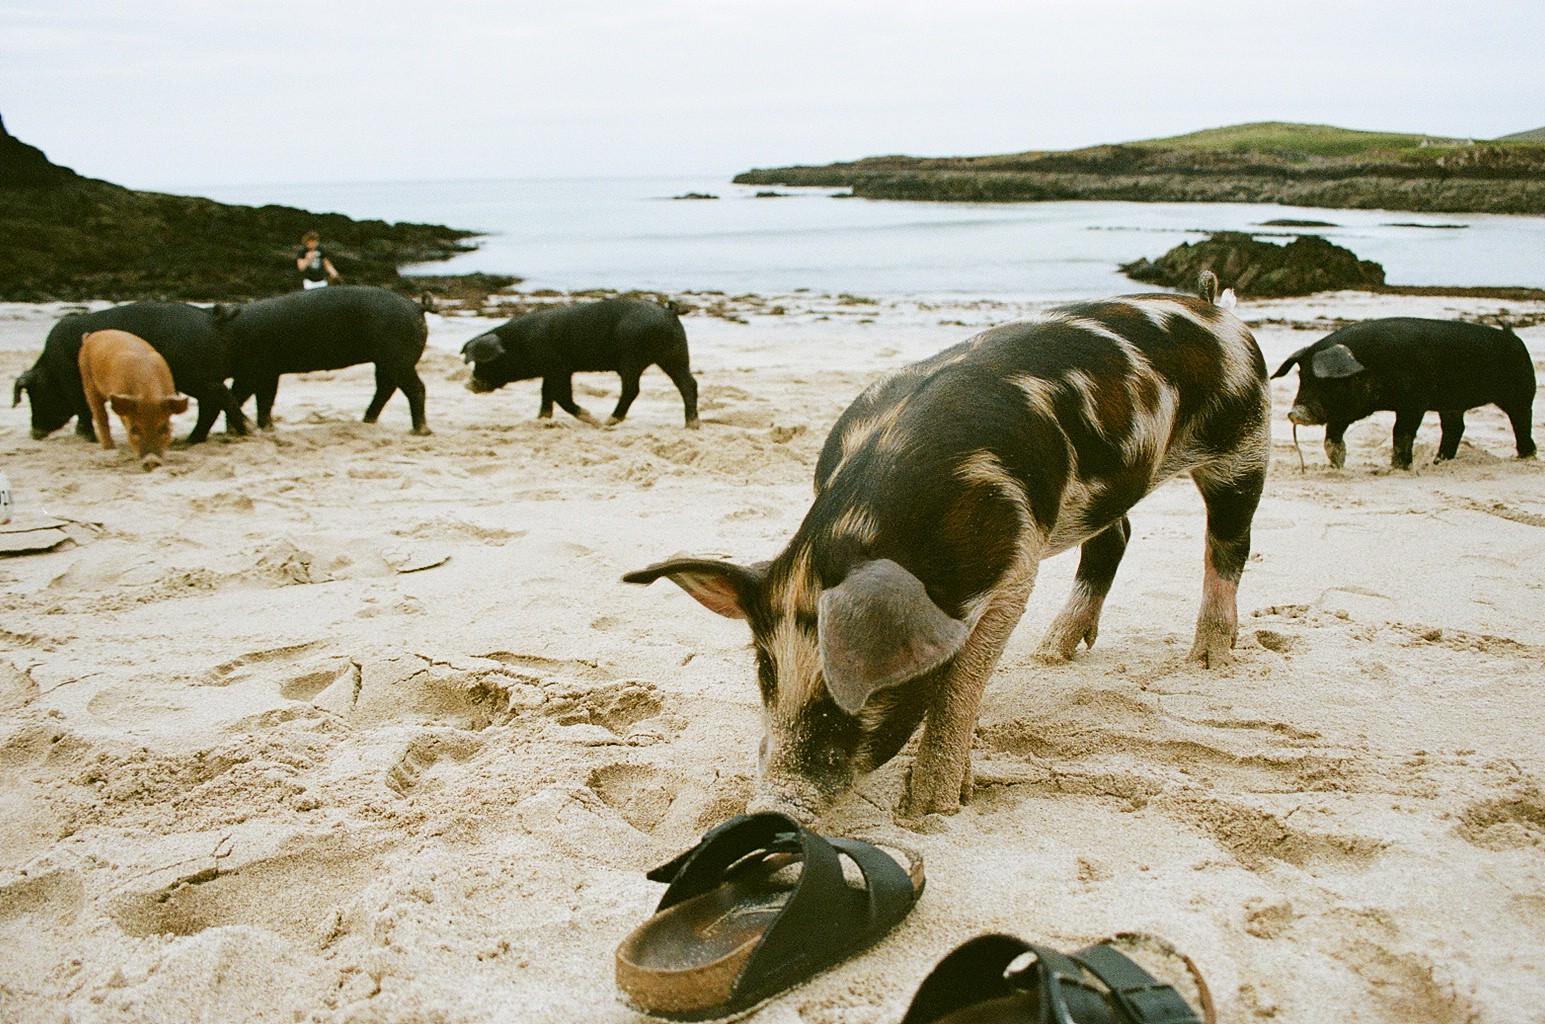 The Little Magpie Scotland Photo Diary North Coast 500 9